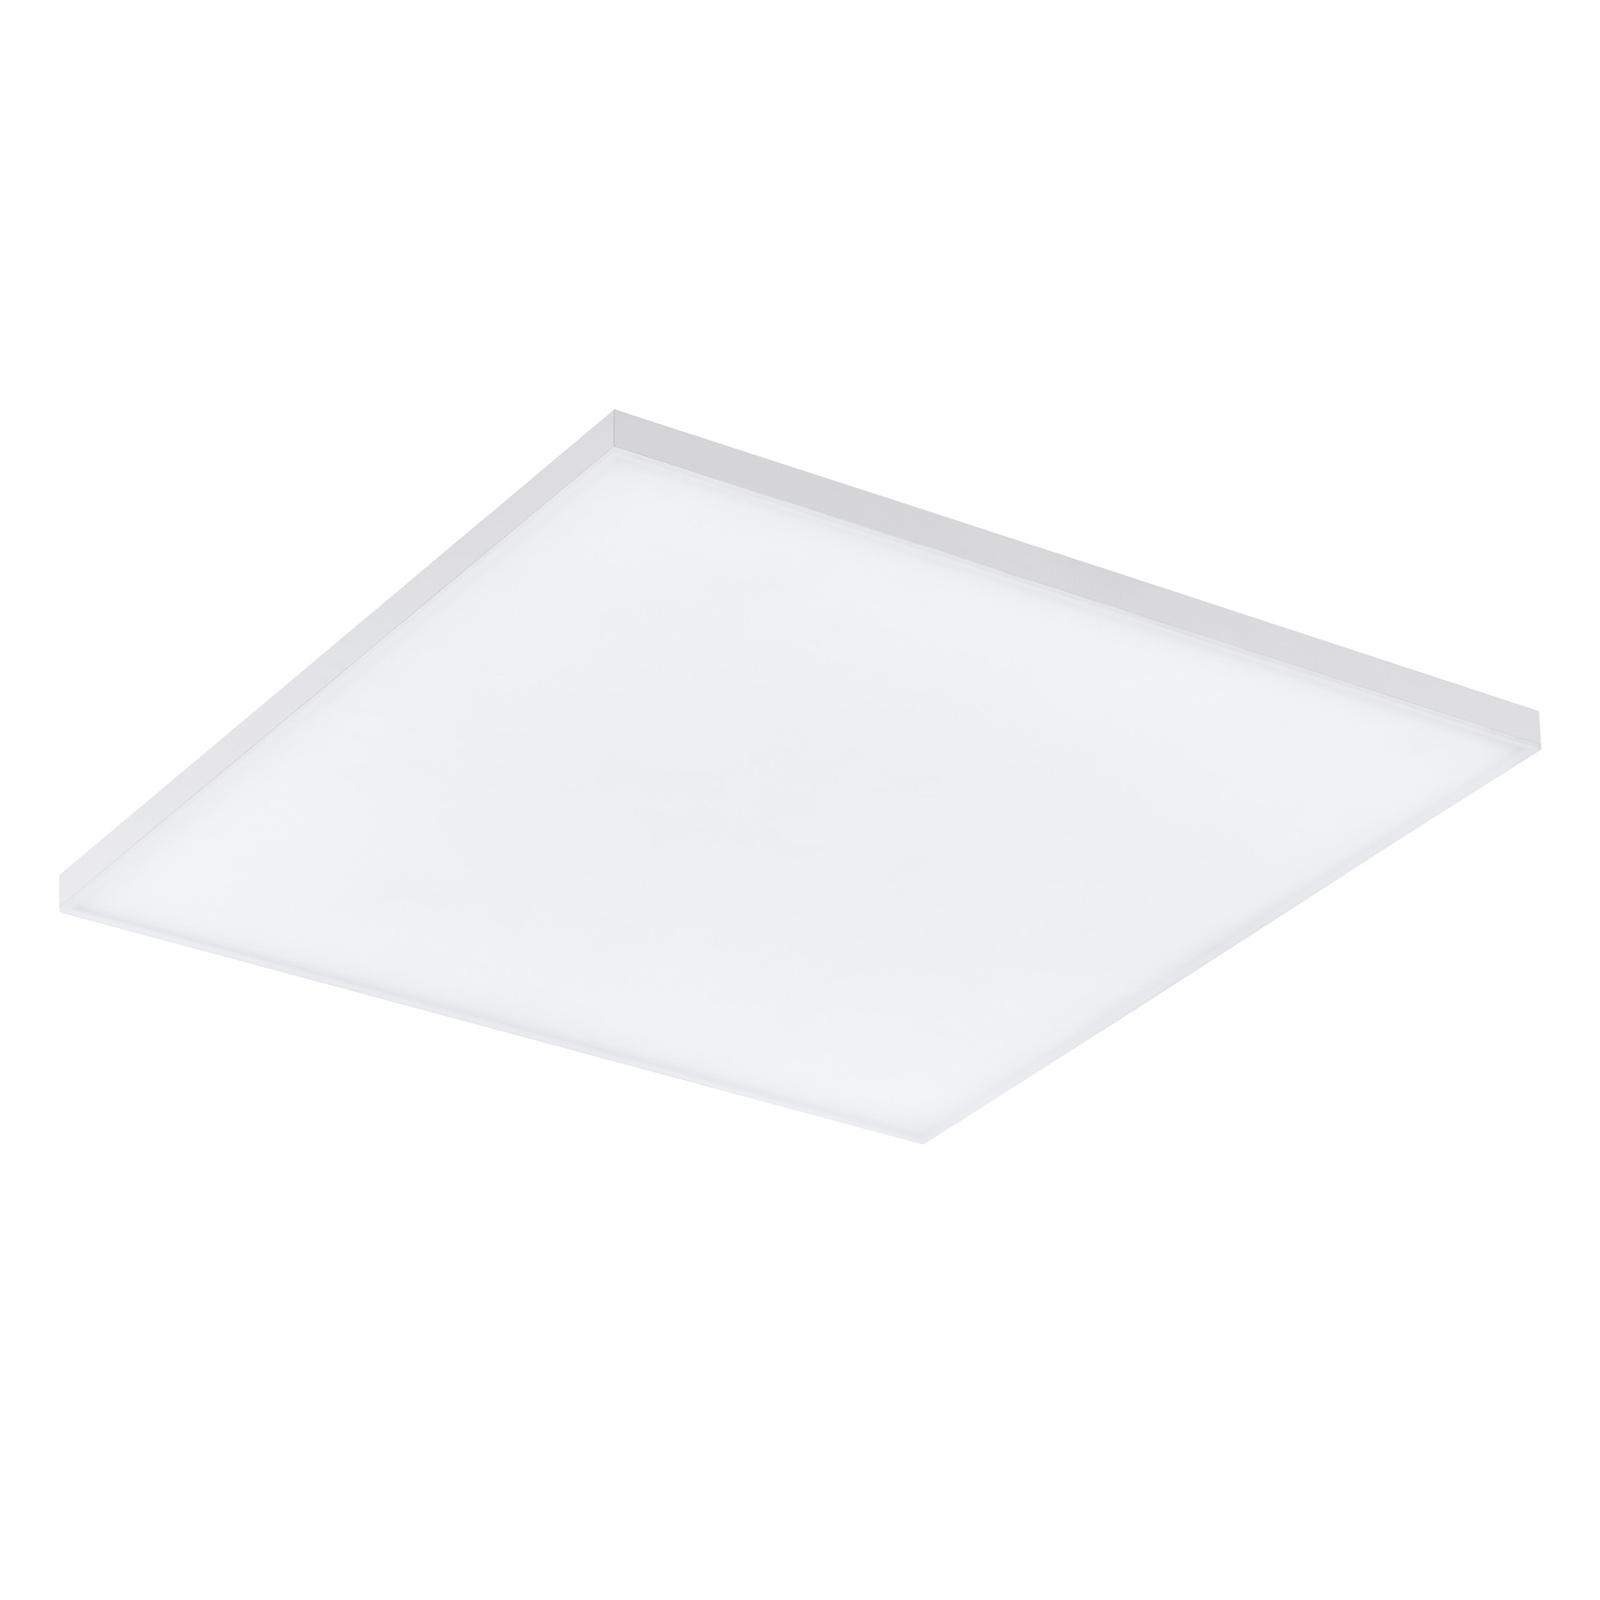 Lampa sufitowa LED Turcona, 45 x 45 cm